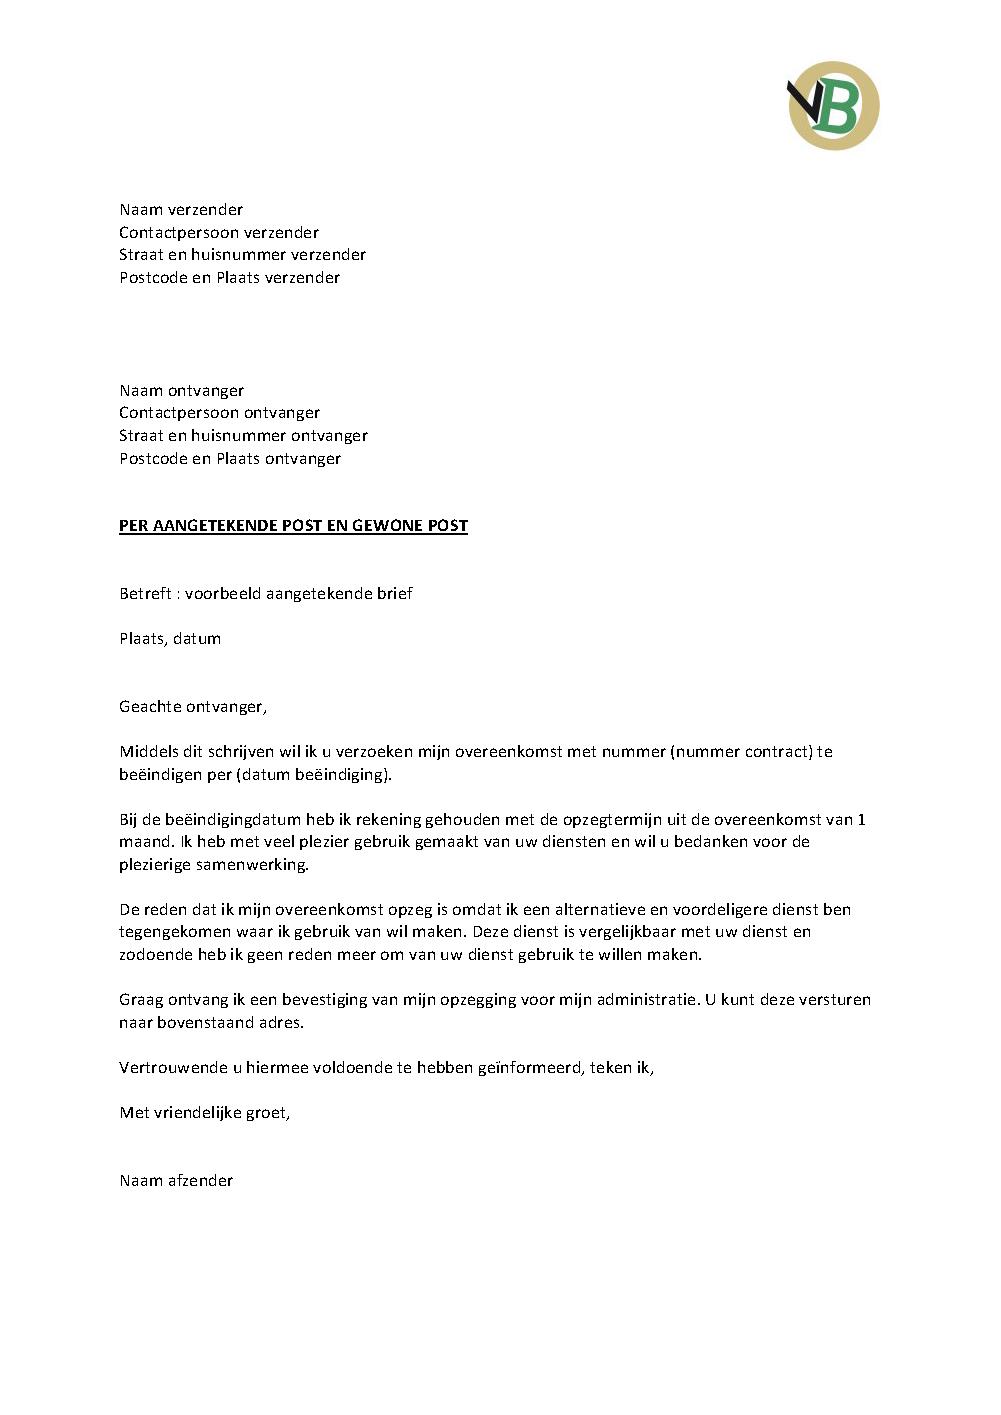 Voorbeeld Aangetekende Brief